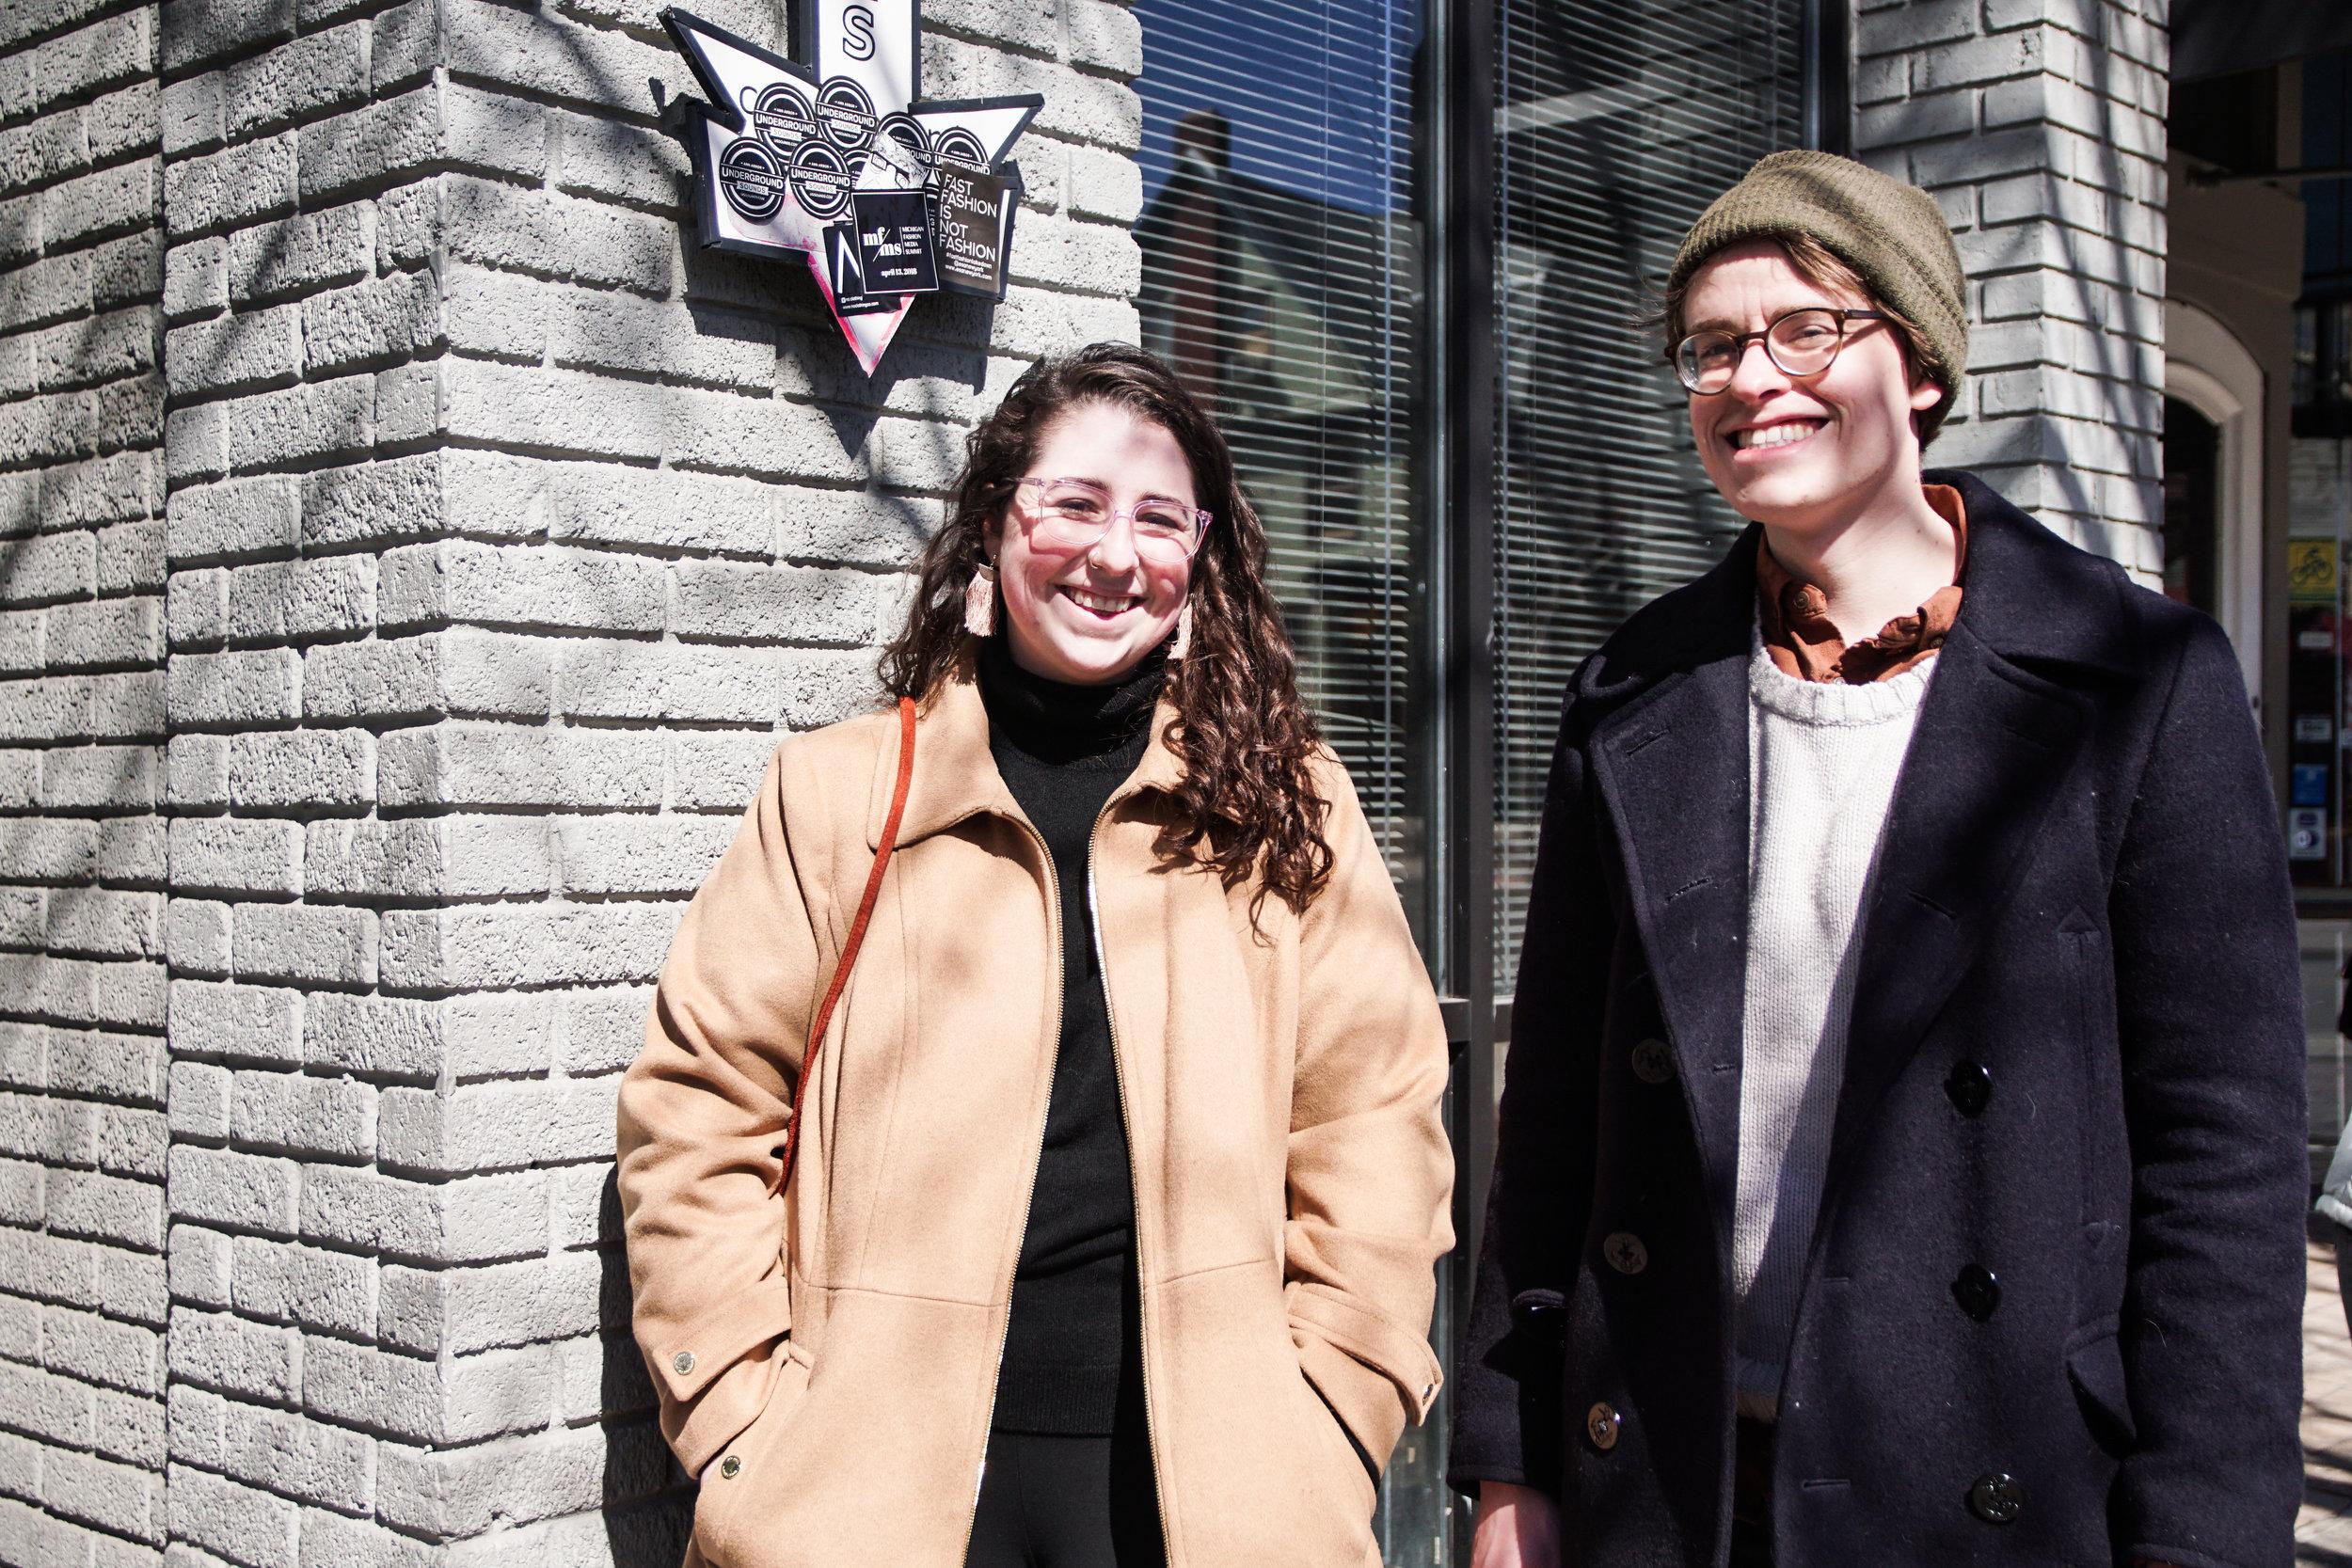 Amanda Bialk and Michael Ferguson